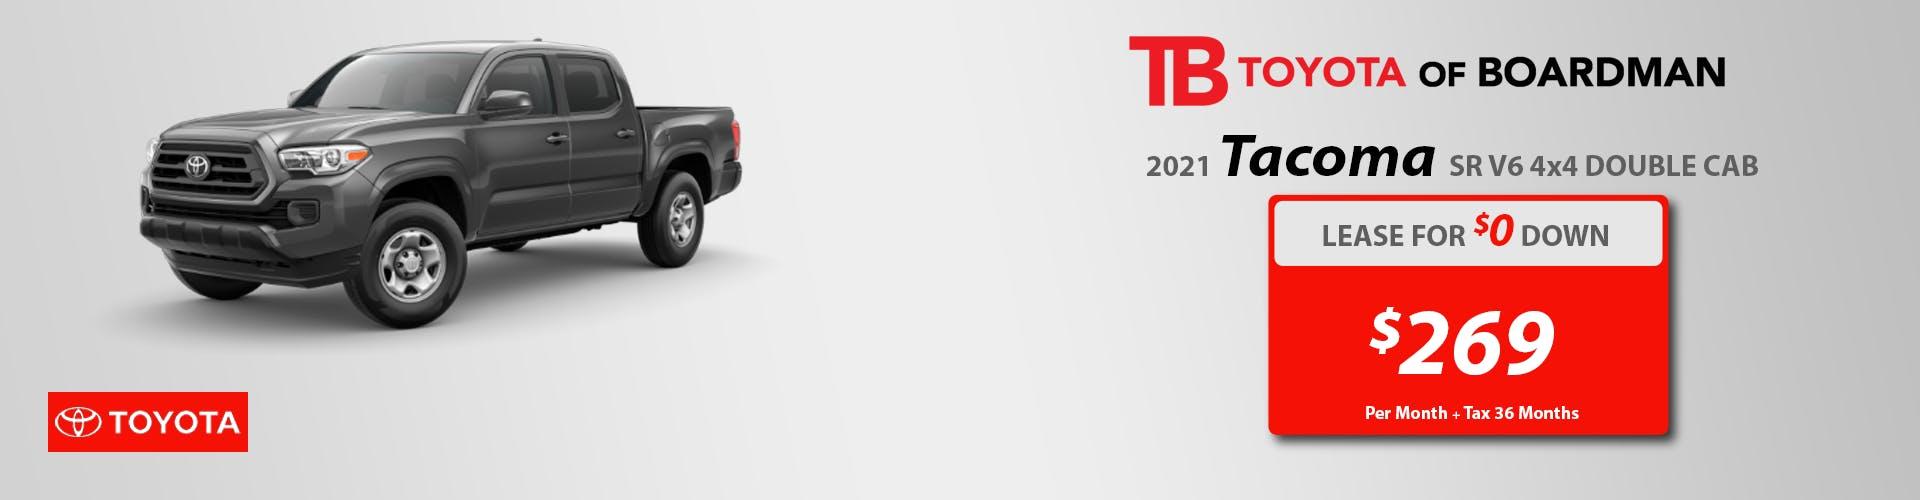 NEW 2021 TOYOTA TACOMA SR 4X4